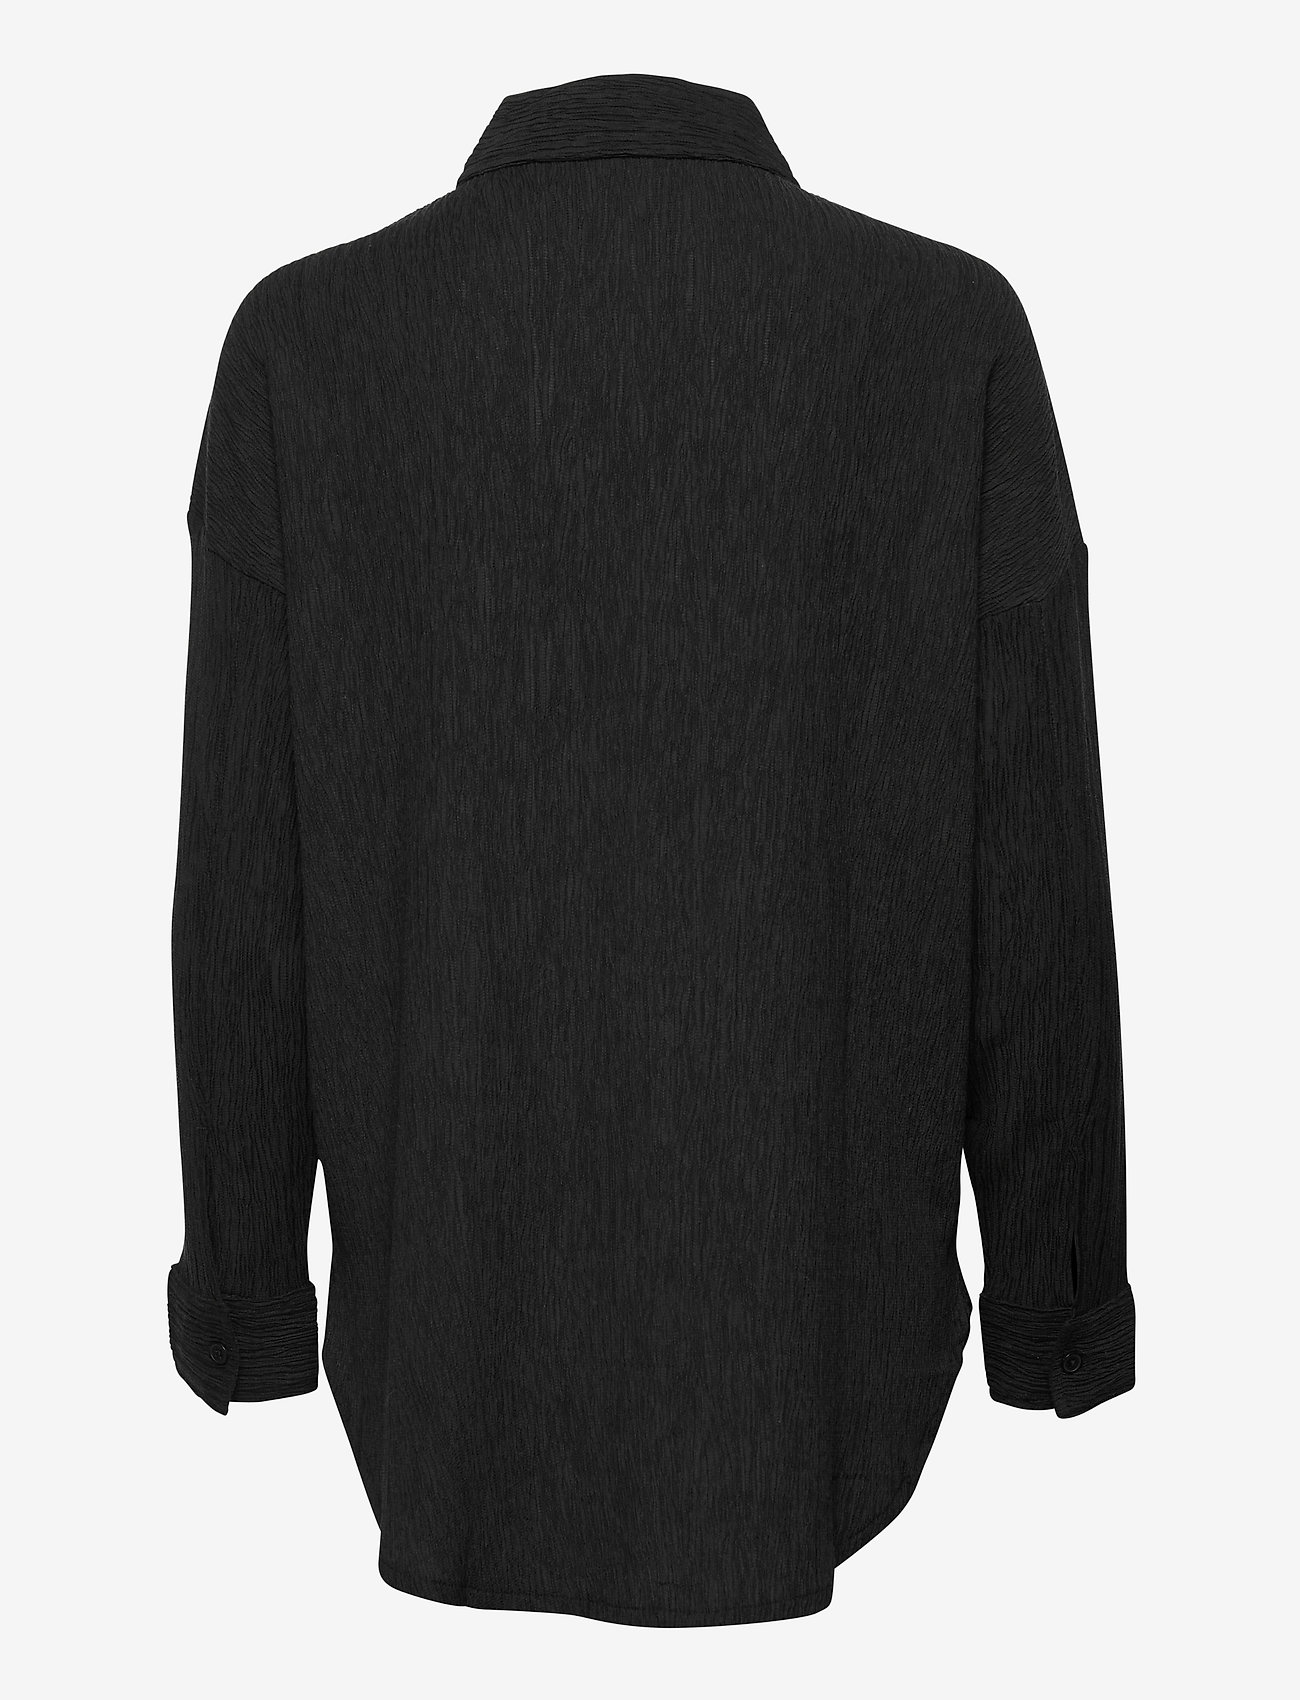 Lindex - Corinne Shacket Plisse - vêtements - black - 1